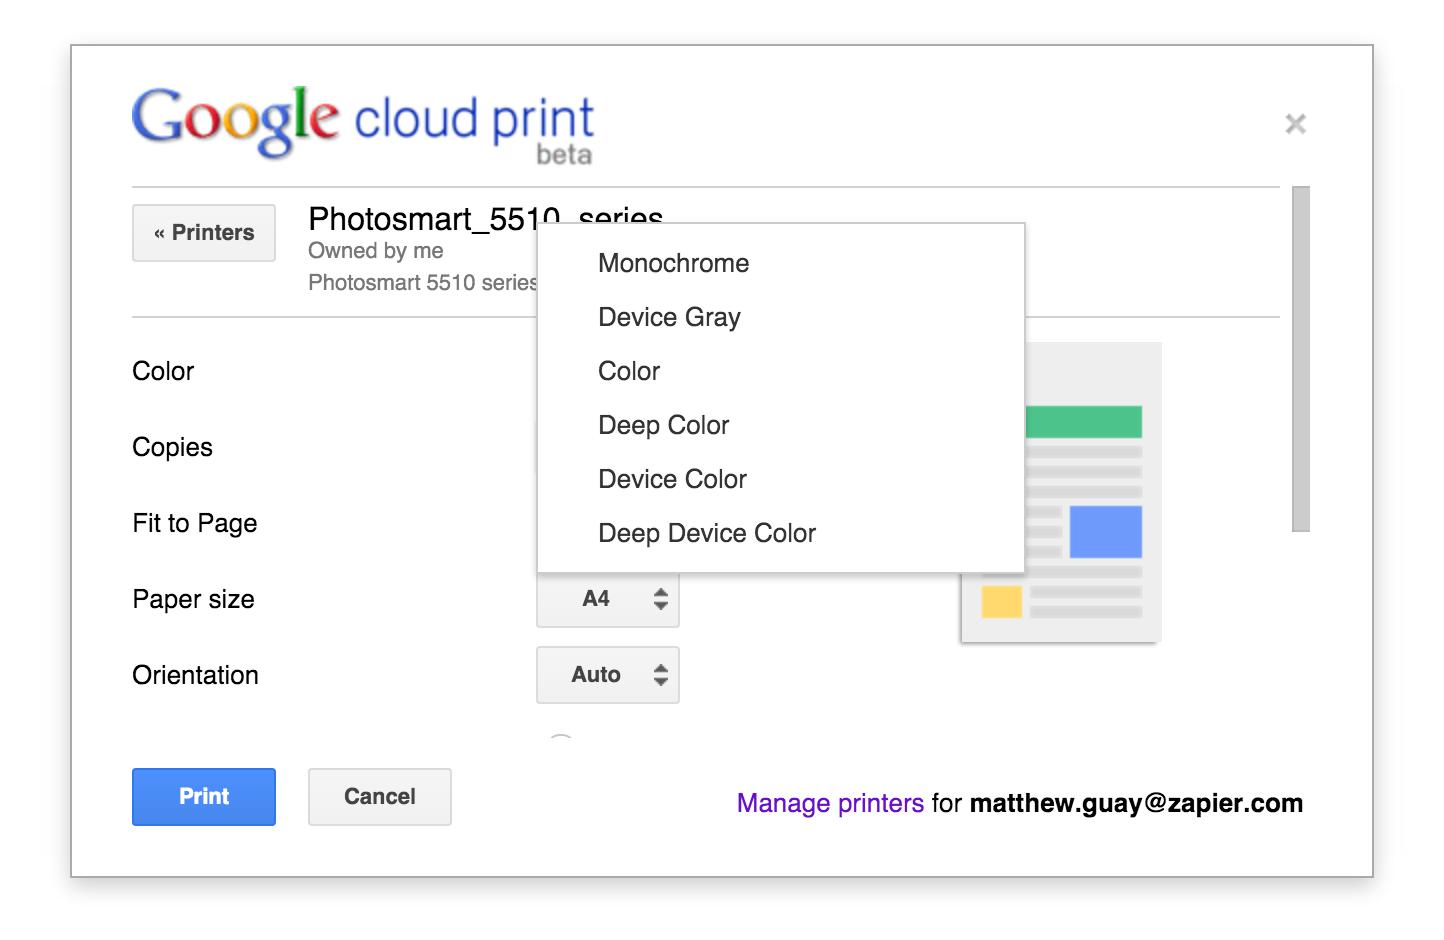 Google Cloud Print Features